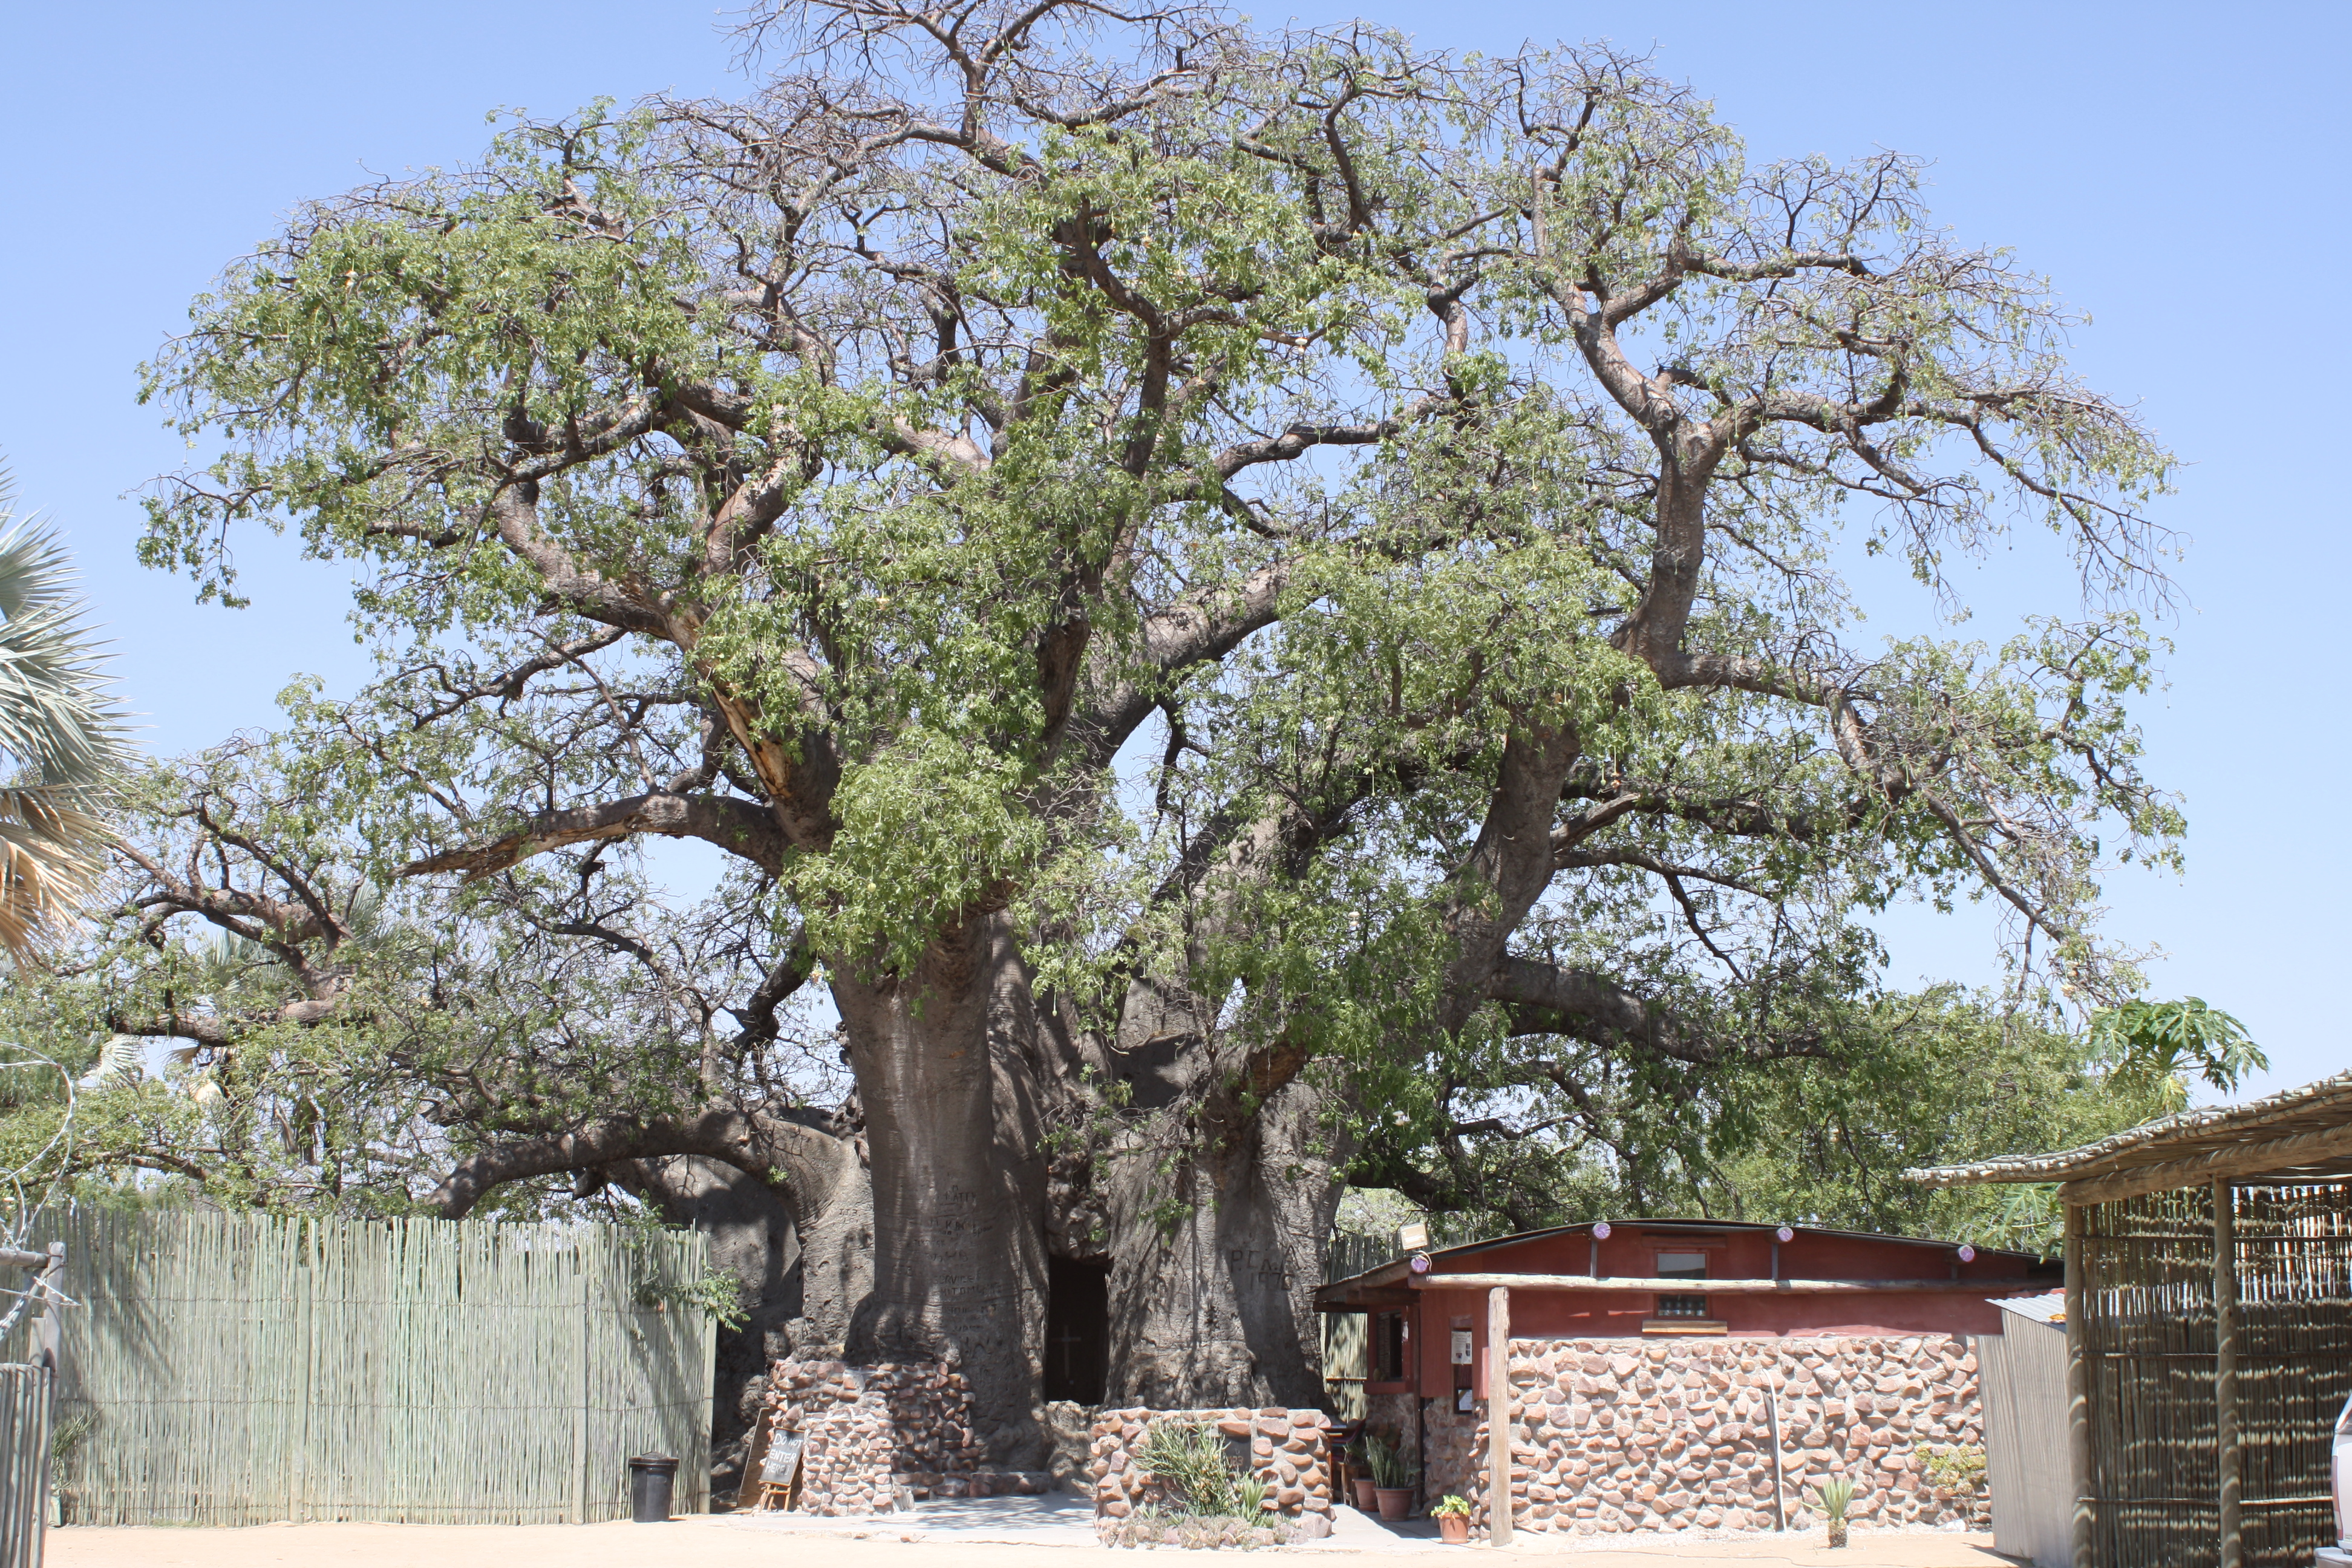 Self-drive, Namibia, Adventure, Caprivi, Zambezi, Etosha, namibia self-drive, open africa, millennium challenge account